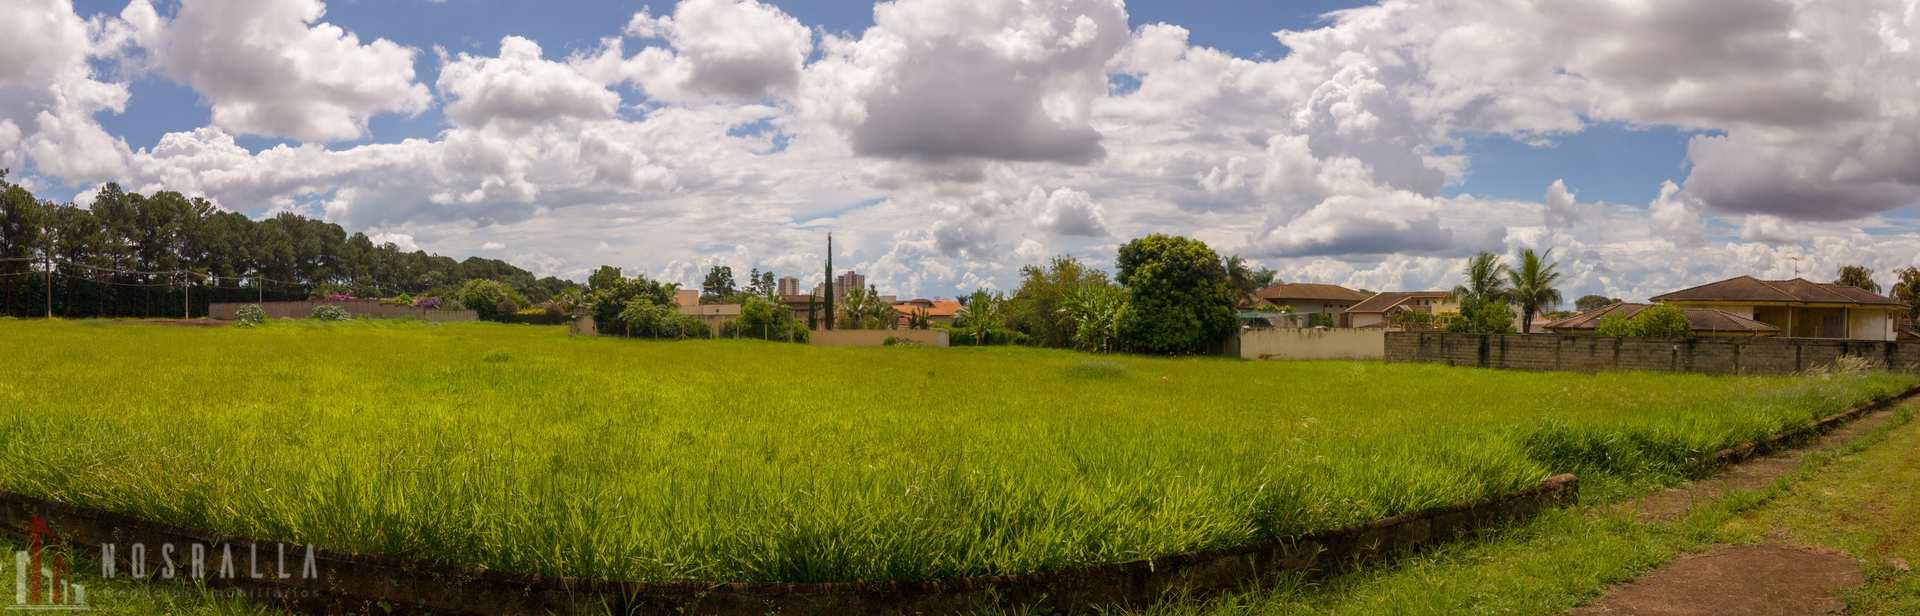 Terreno de Condomínio, Jardim Canadá, Ribeirão Preto - R$ 1.12 mi, Cod: 1722176